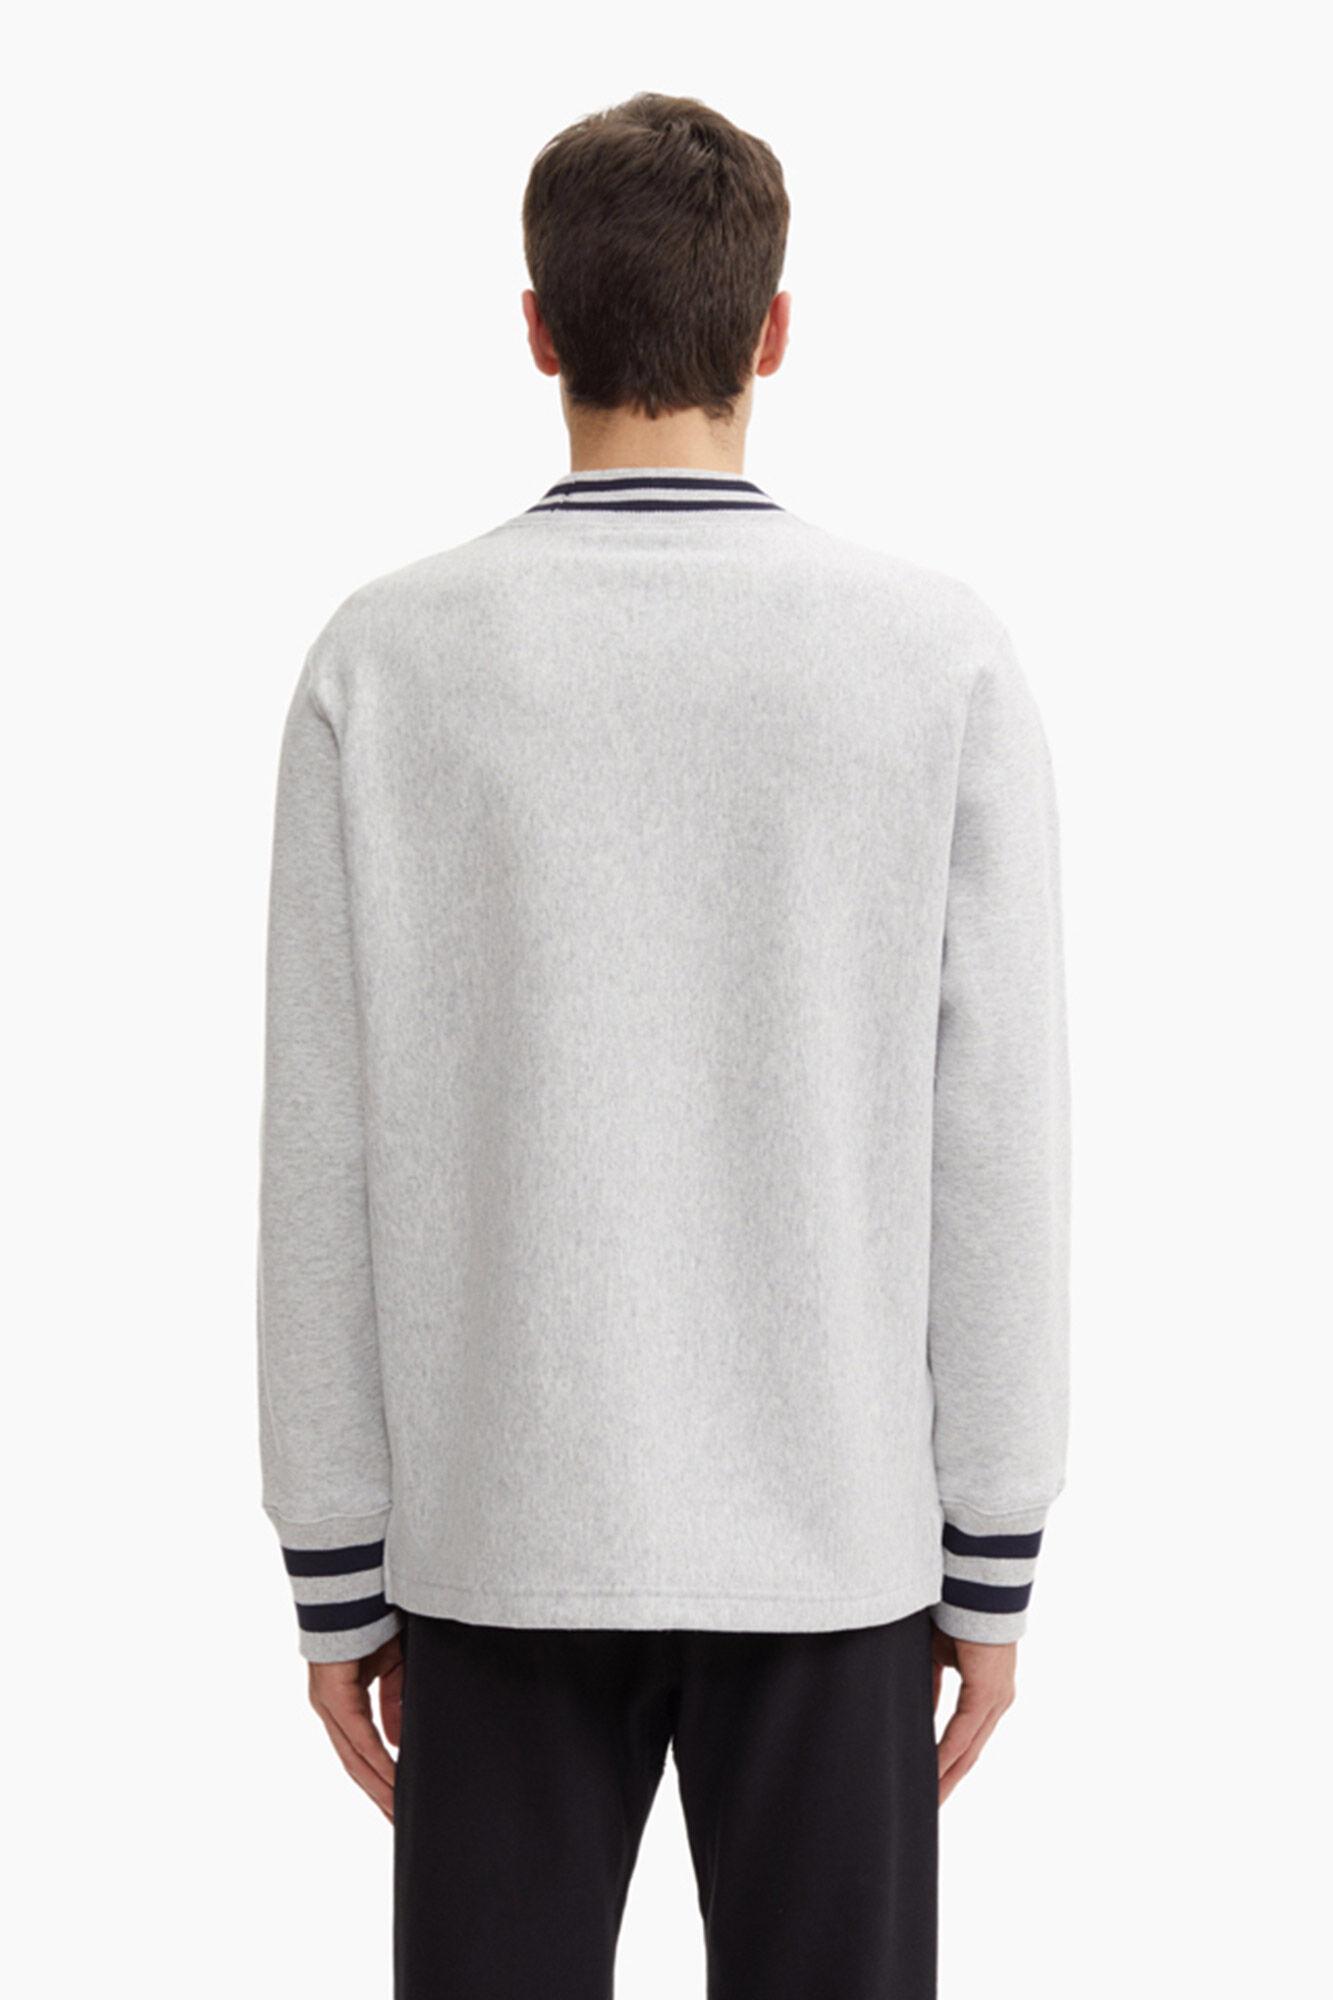 High Neck Sweatshirt 213029, LOXGM